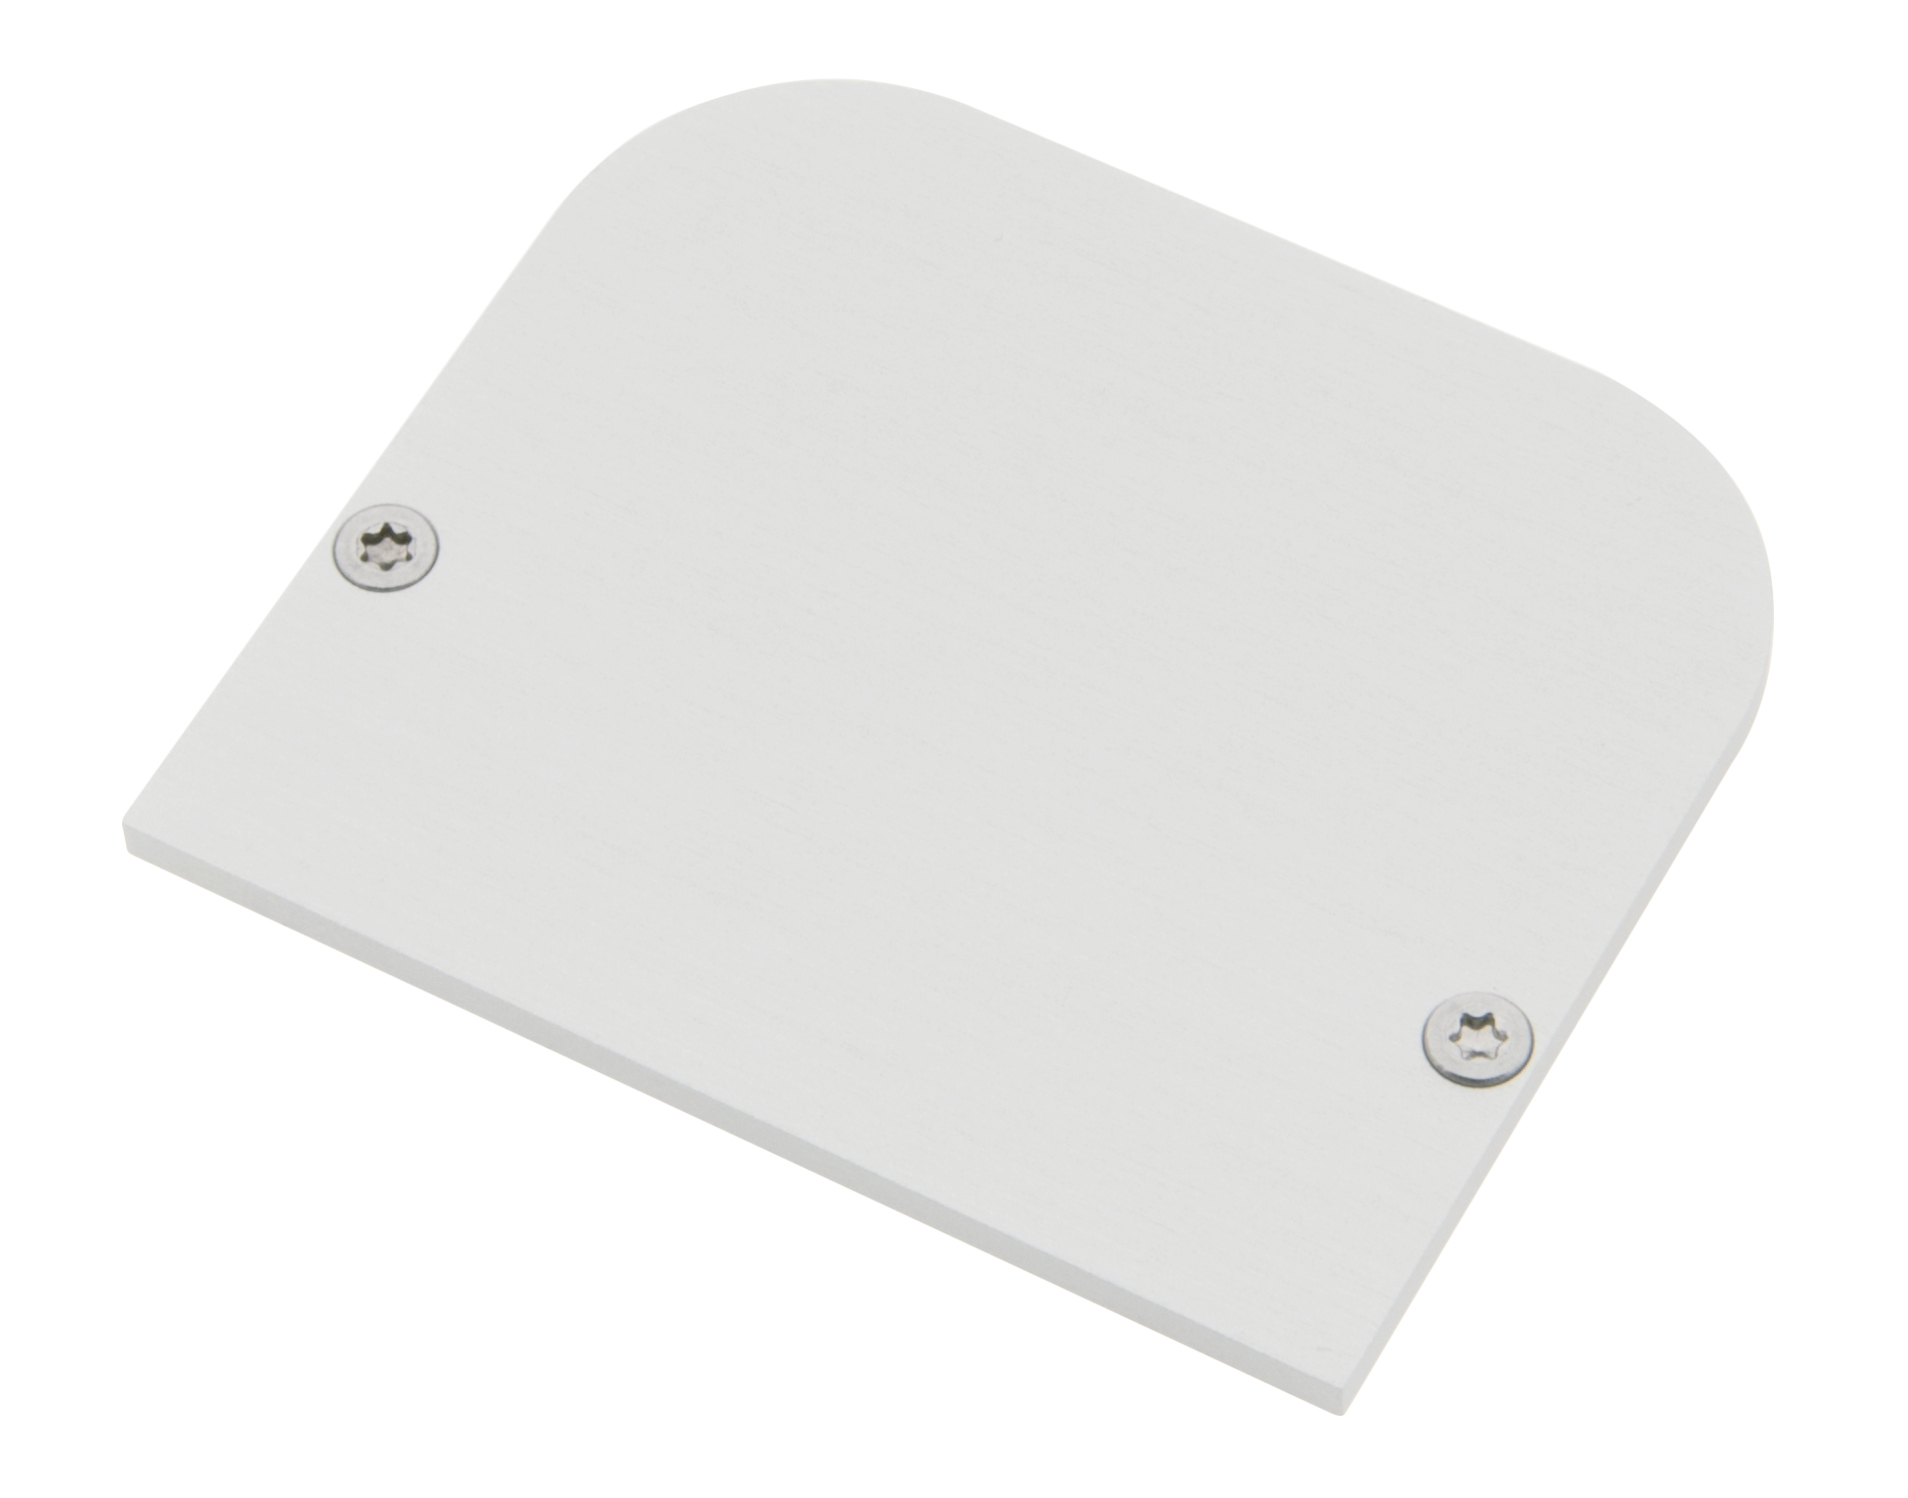 1 Stk Profil Endkappe SLA Rund geschlossen inkl. Schrauben LIEK003210